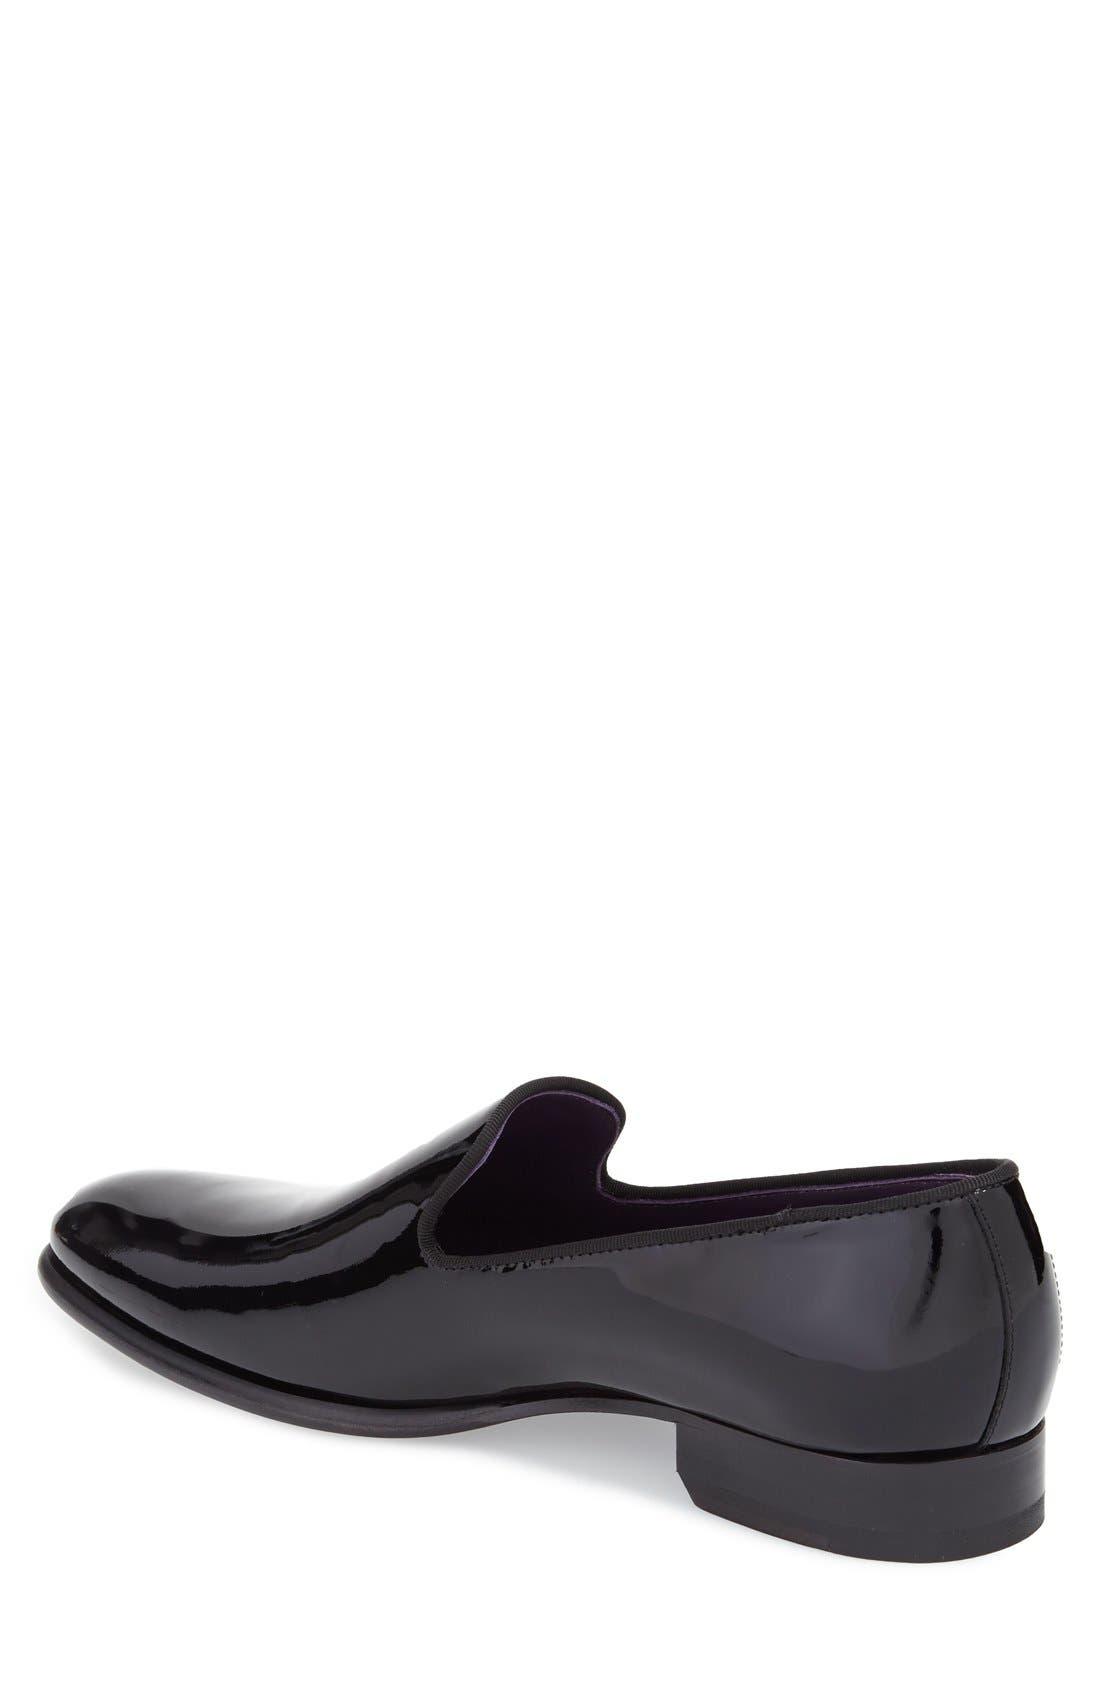 'Delevan' Loafer,                             Alternate thumbnail 2, color,                             Black Patent